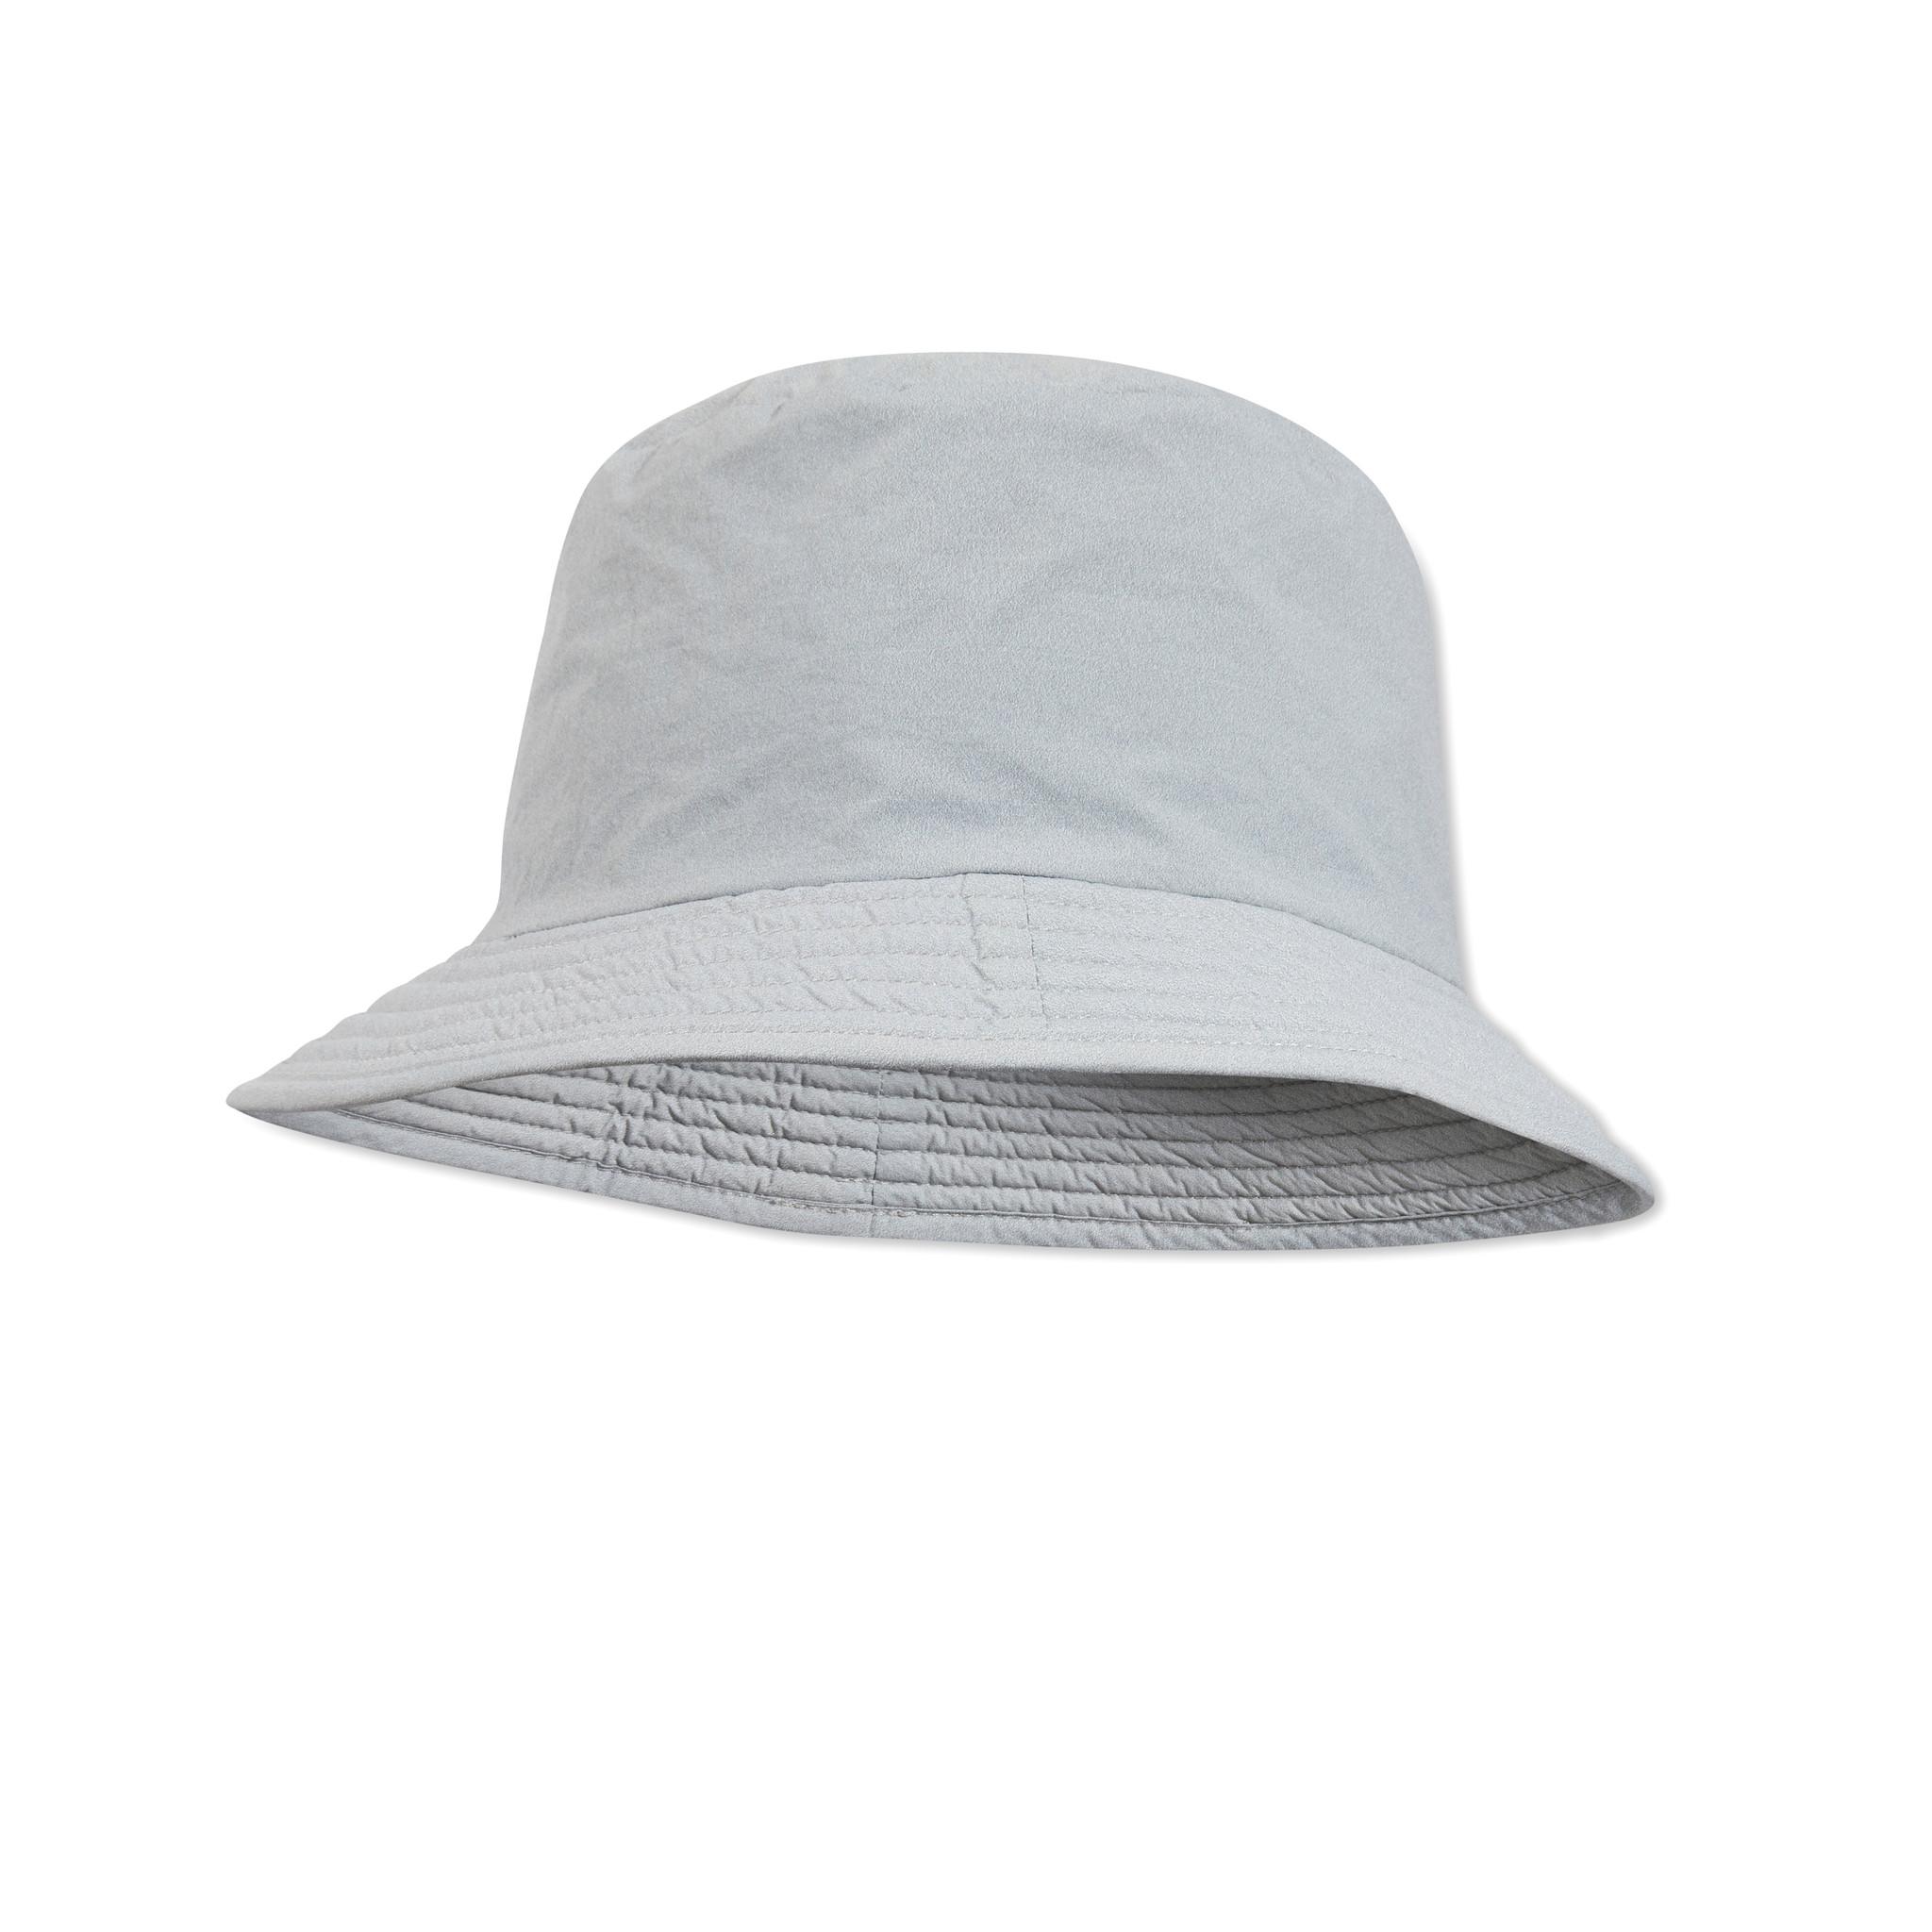 ASTER BUCKET HAT - QUARRY BLUE-1